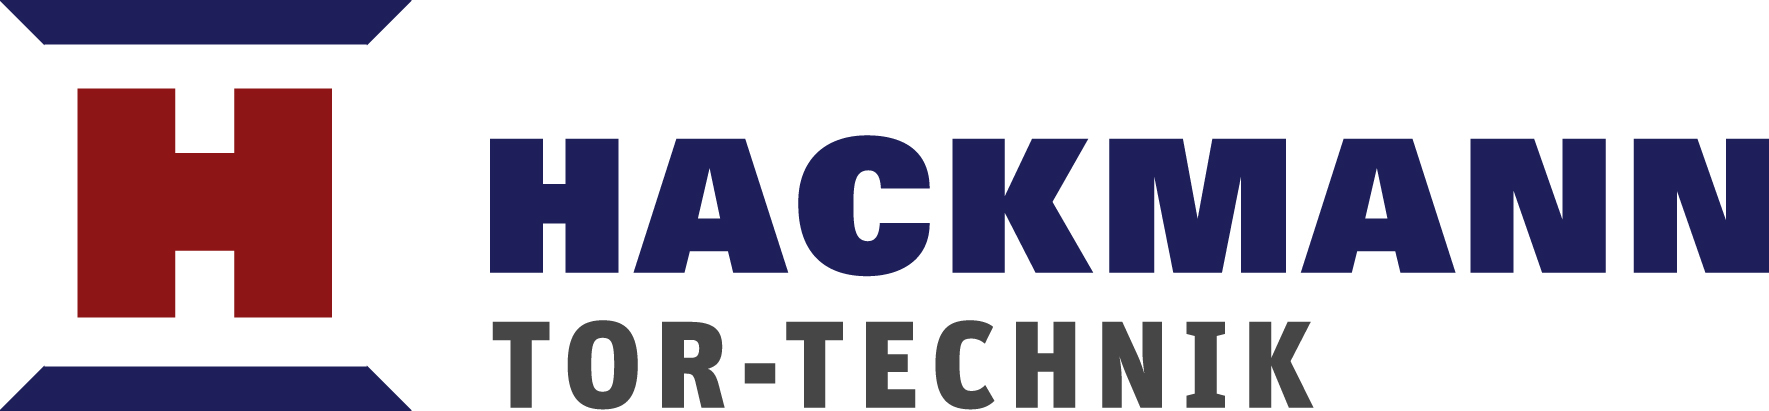 HACKMANN Tor-Technik